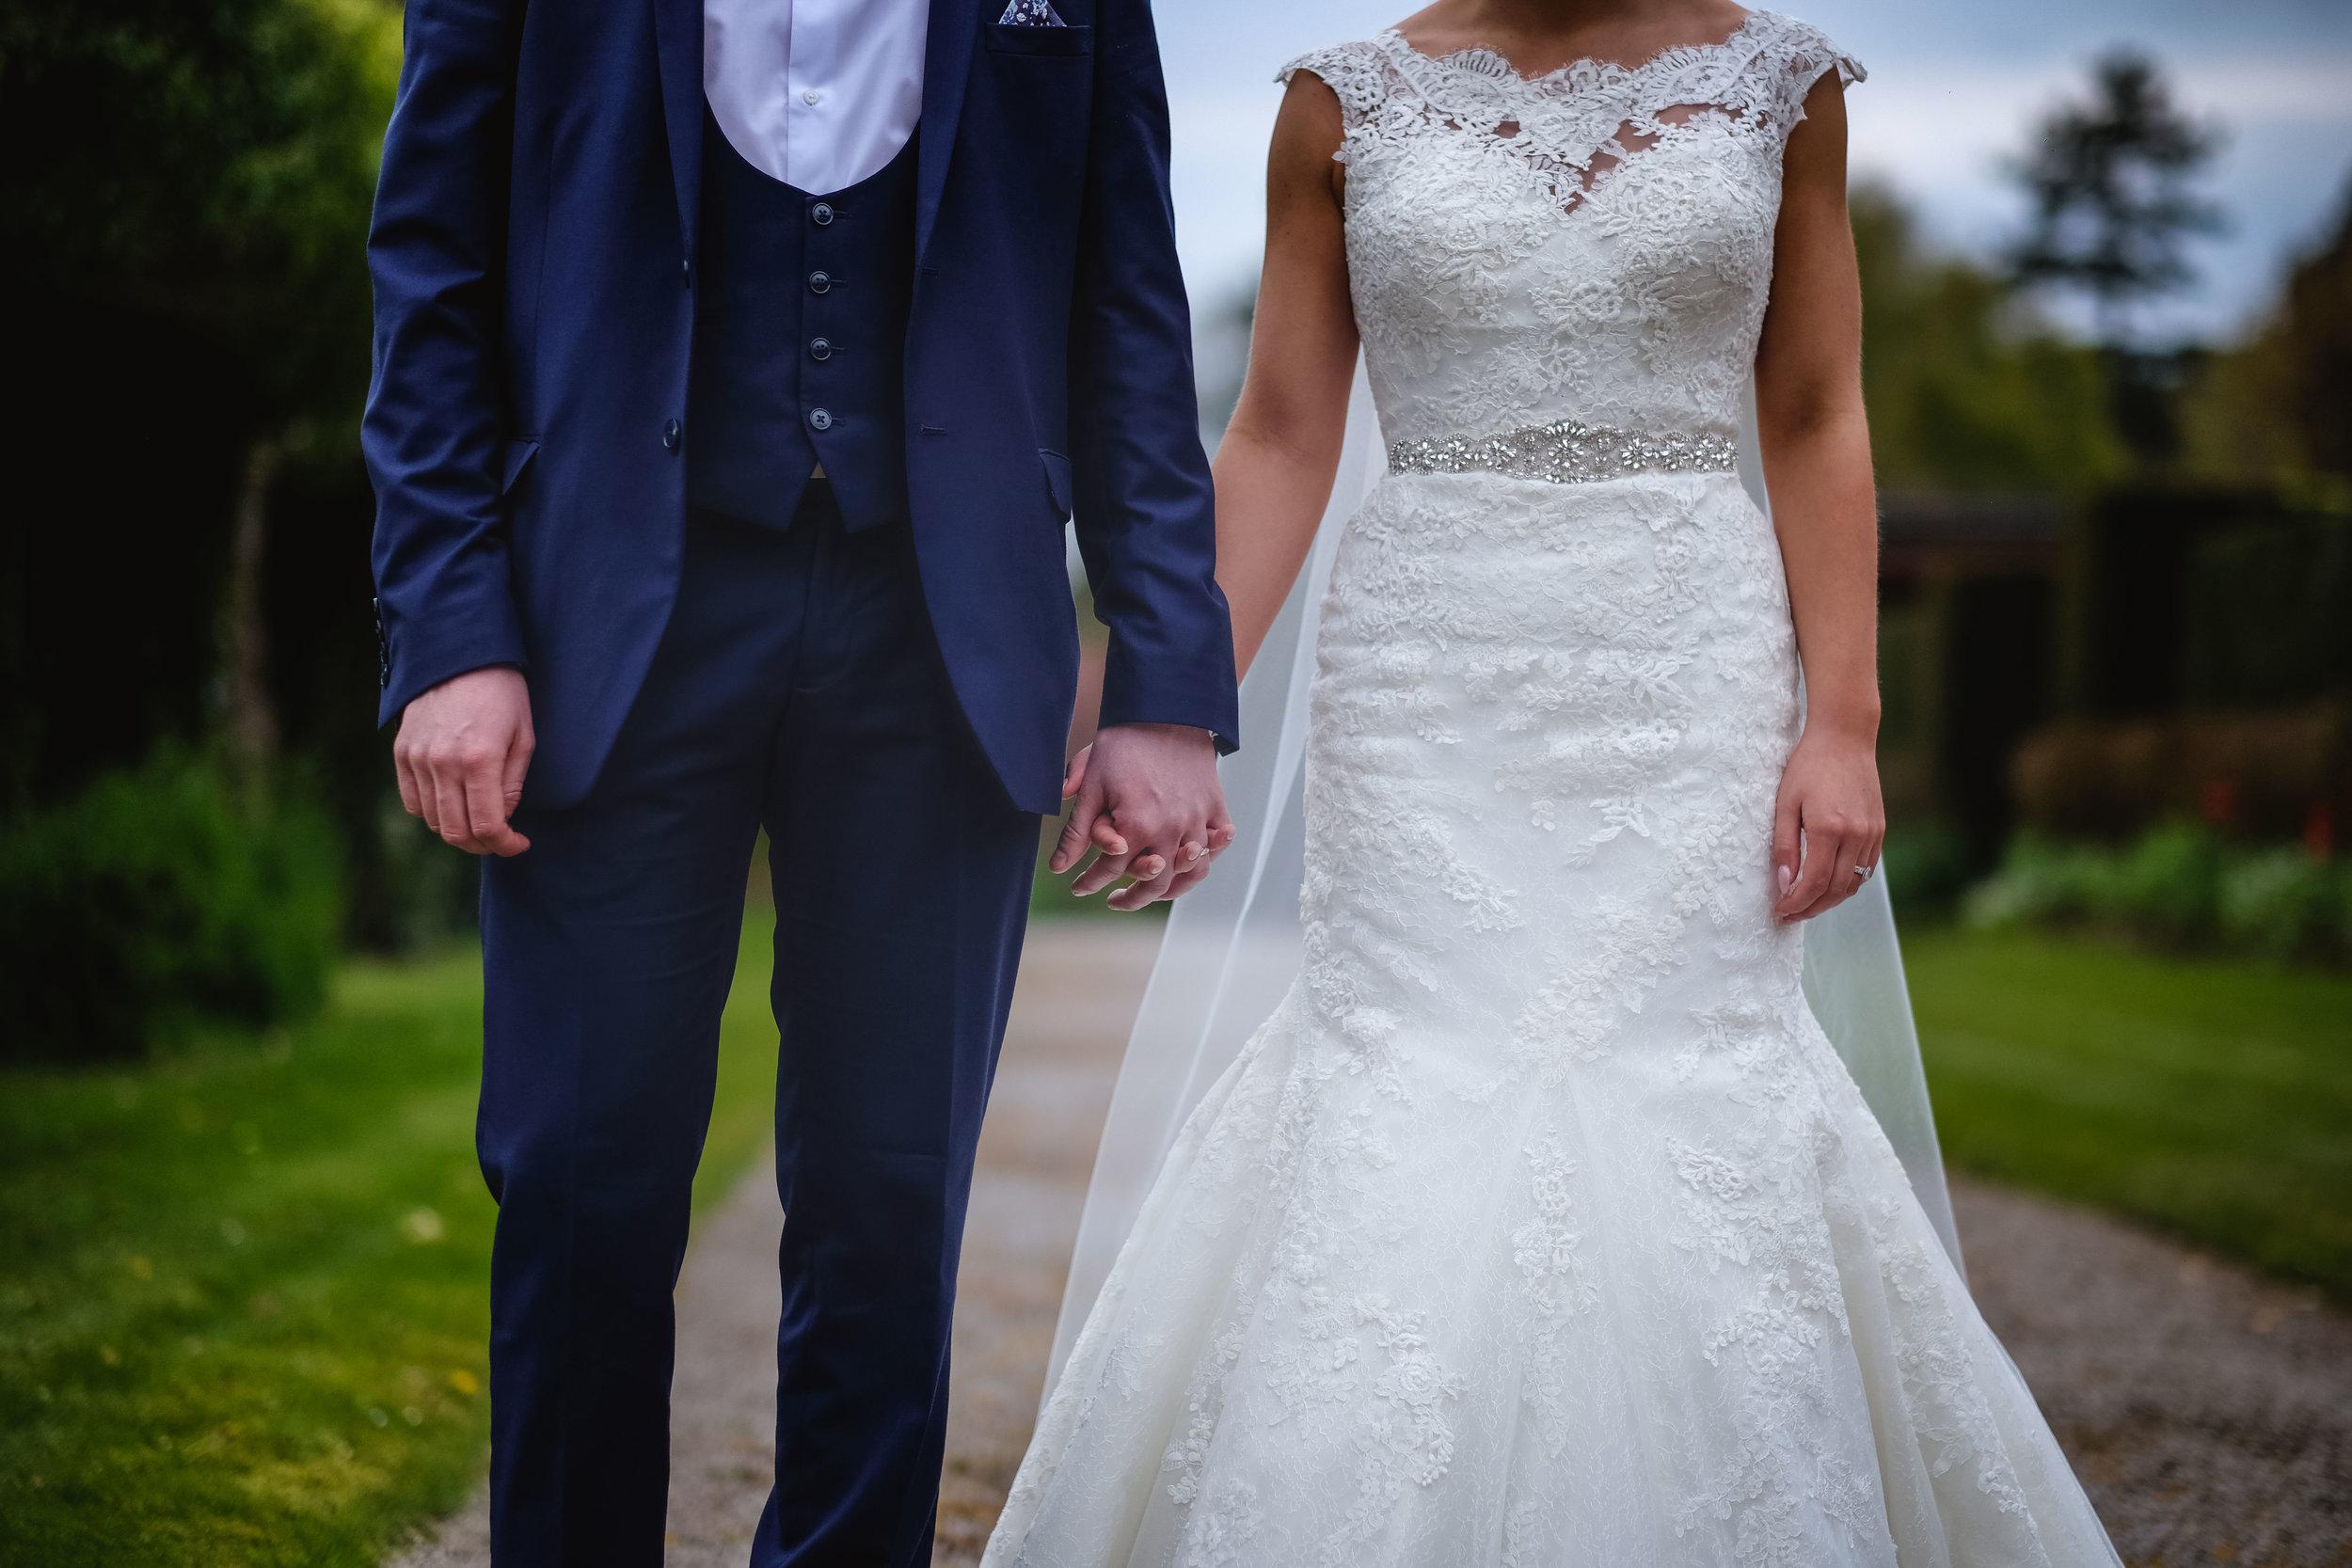 Thornton manor wedding photography cheshire wedding photographer liverpool manchester warrington chester wirral wedding BLOG (82 of 108).jpg